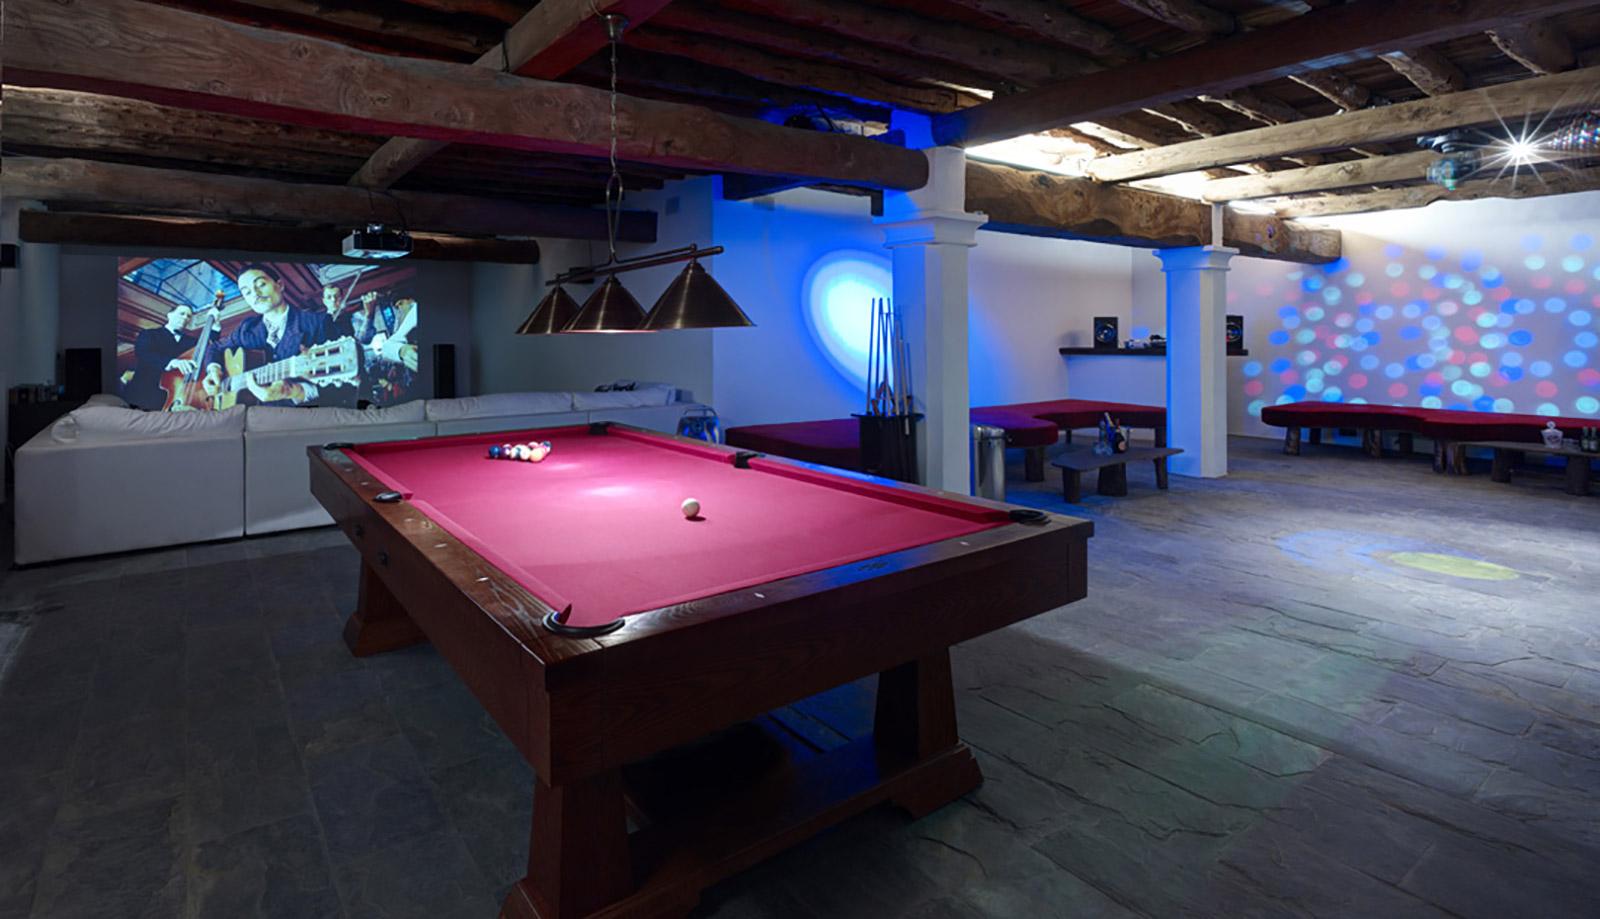 The-Lizard-Lounge,-Games-Room,-and-cinema